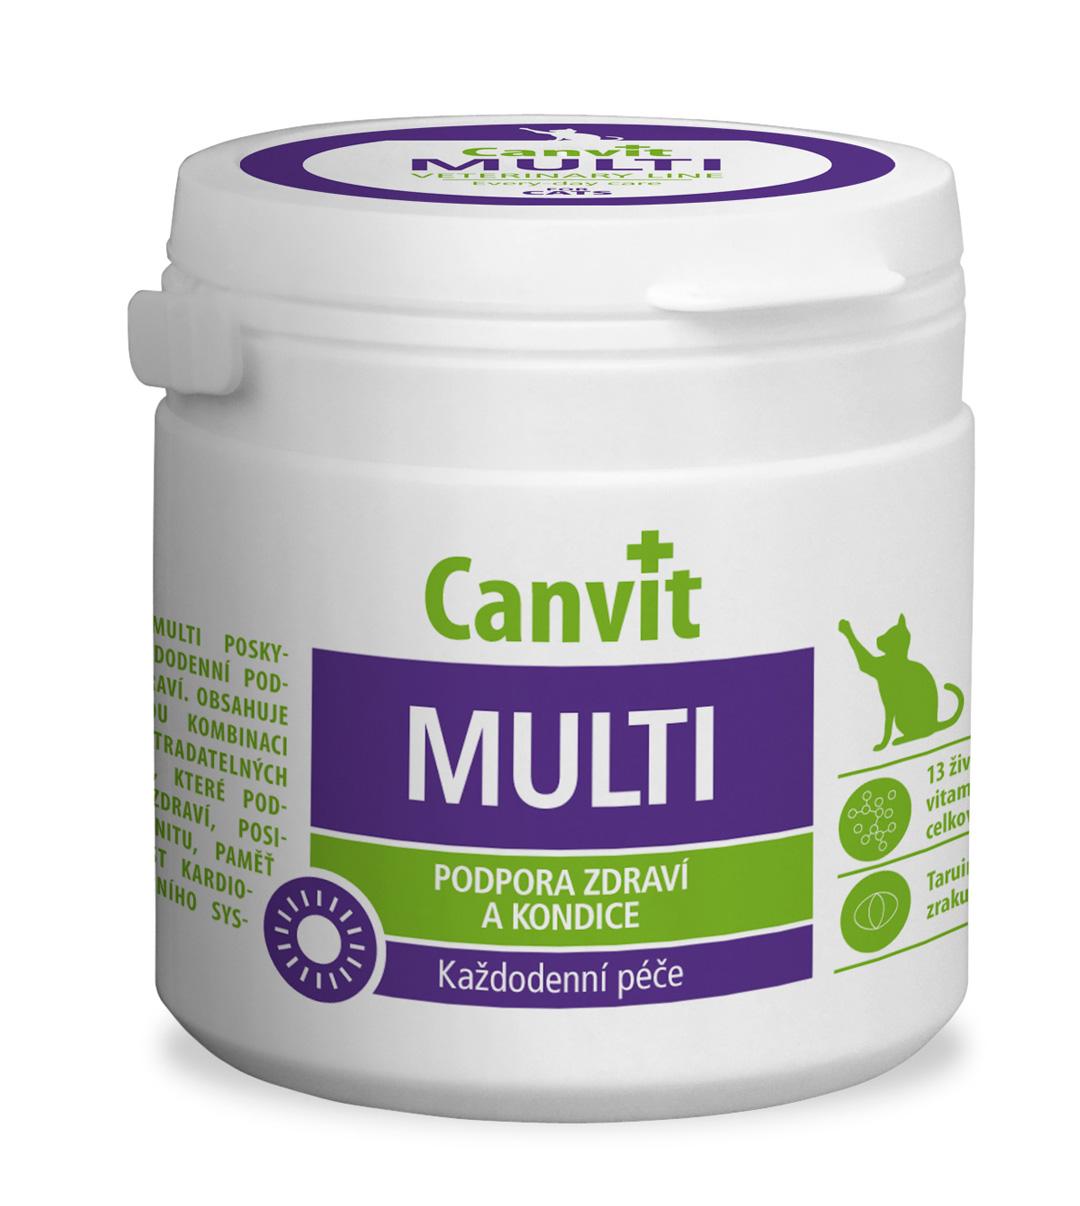 Multi Vit Wp 100gram Vitamin Vitamins For Daily Care